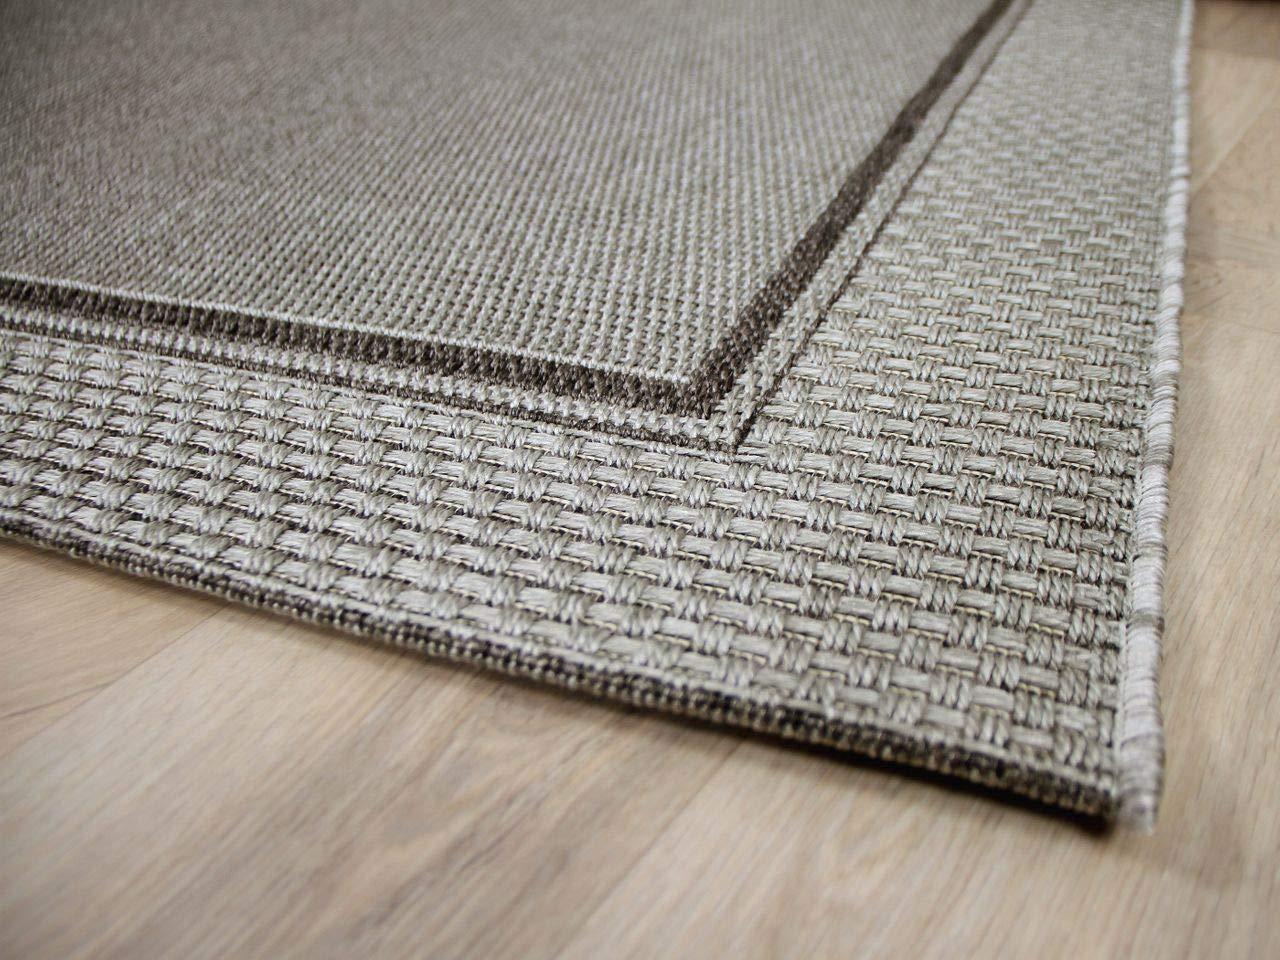 In & Outdoor Teppich Flachgewebe Natur Panama Grau Bordüre in 4 Größen